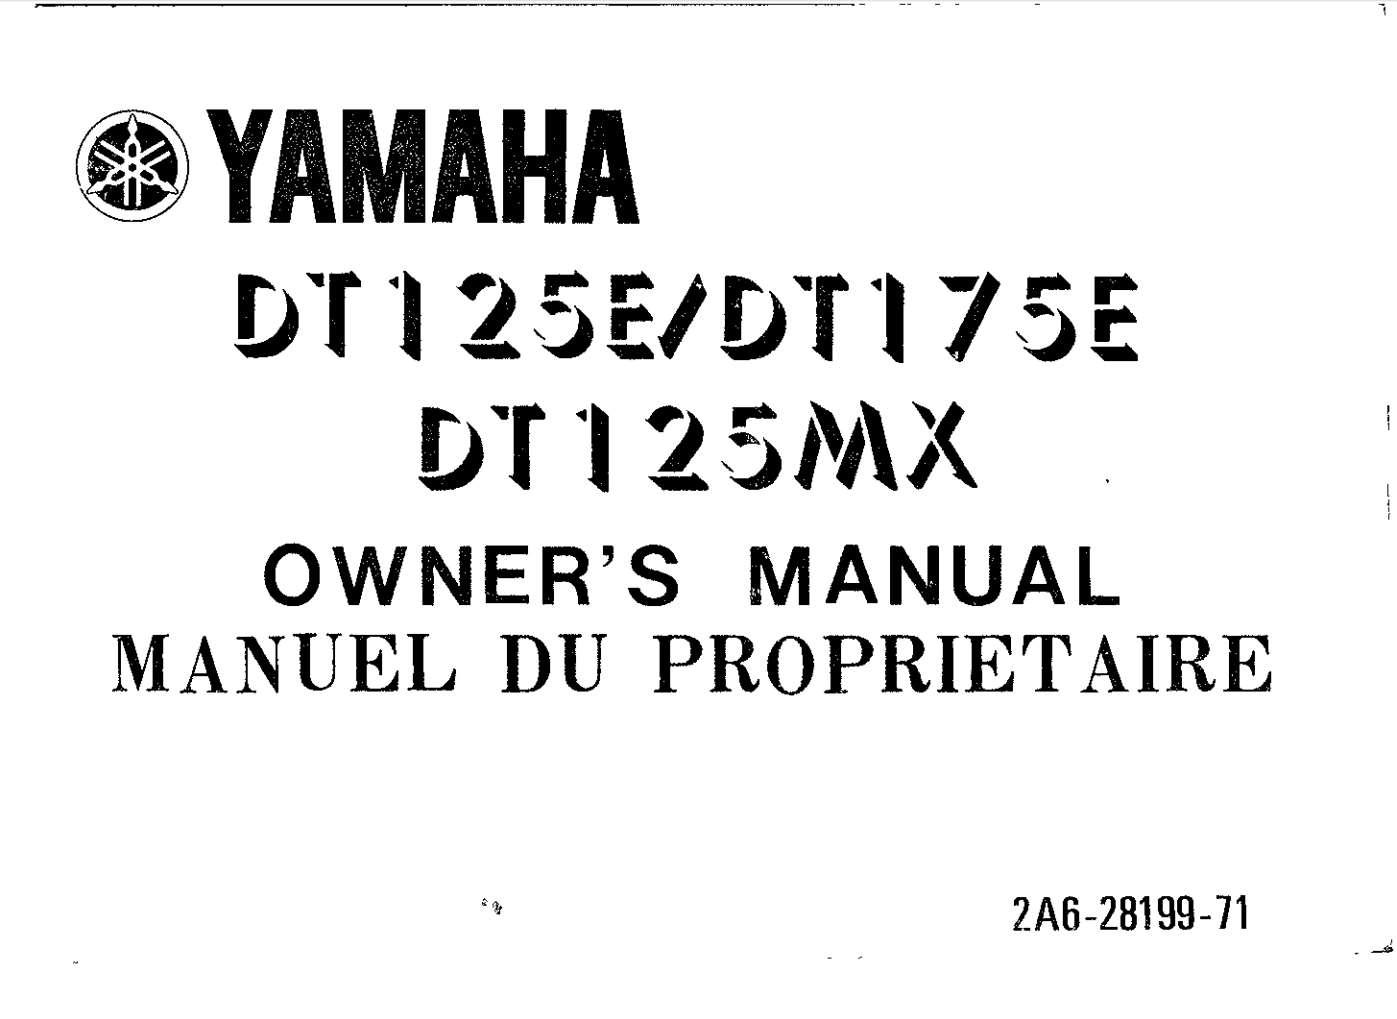 Yamaha DT125 (E) DT175 (E) DT125 (MX) Owner's Manual